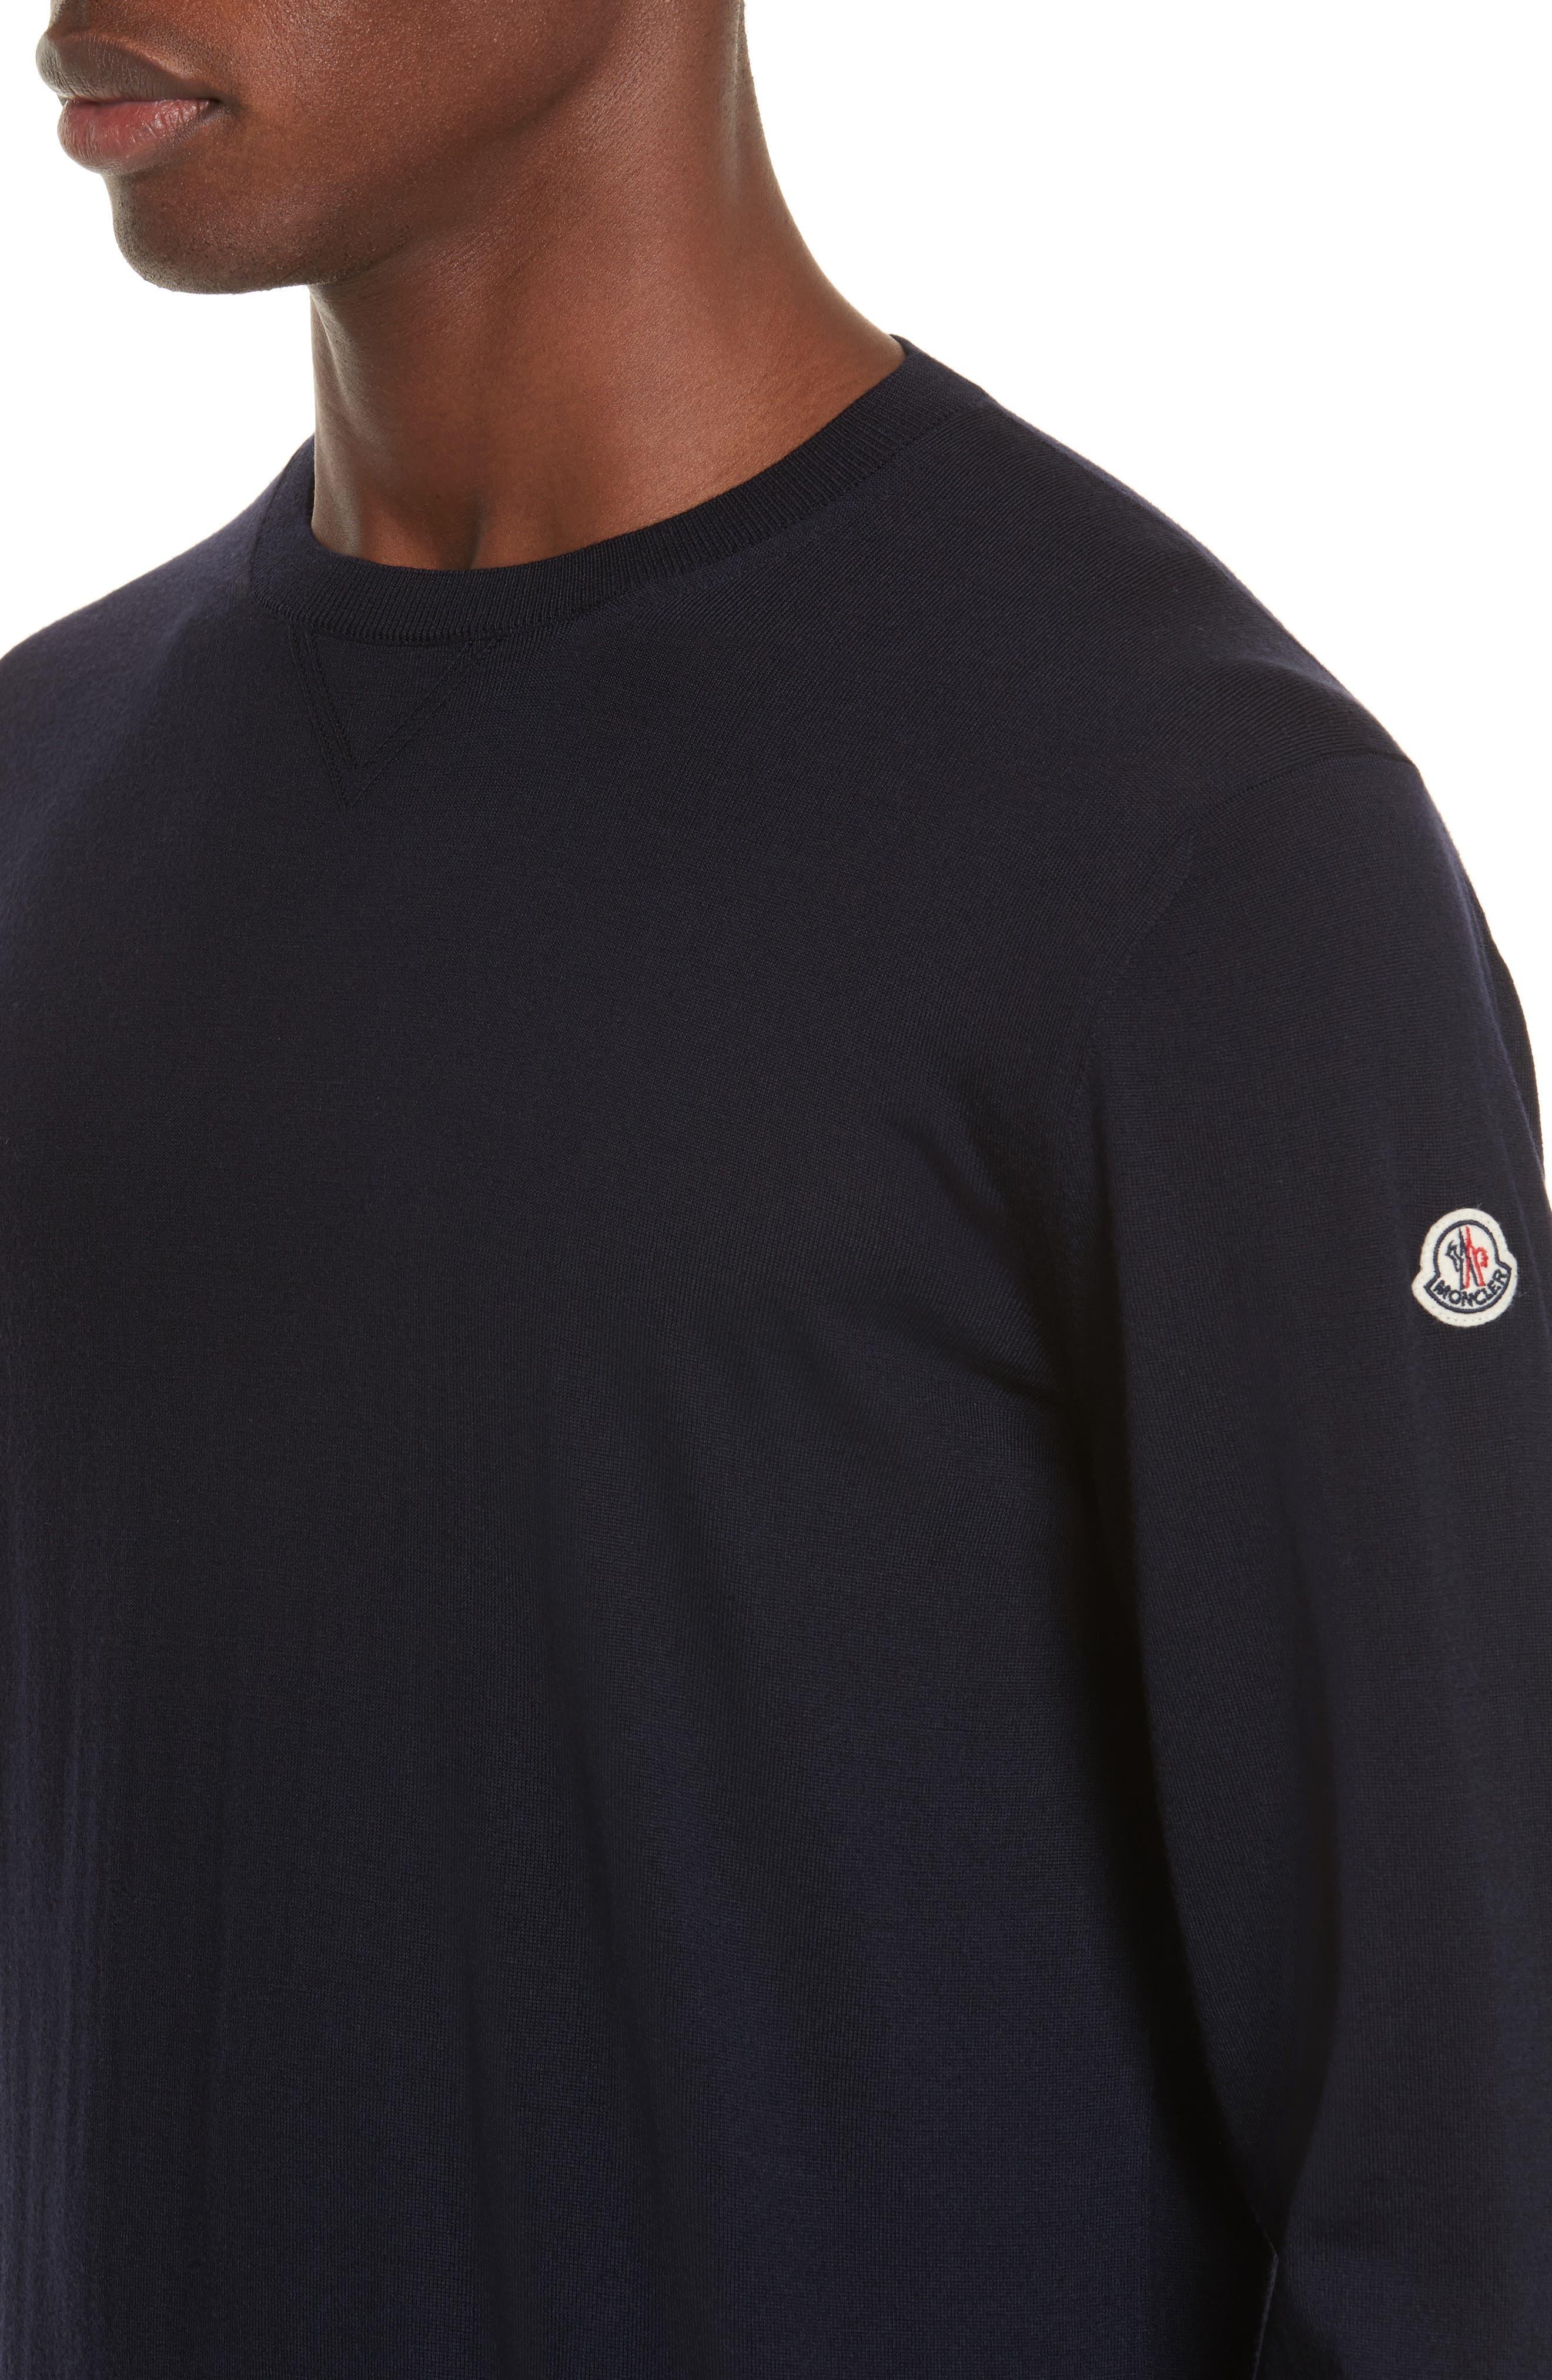 Virgin Wool Crewneck Sweater,                             Alternate thumbnail 4, color,                             Navy